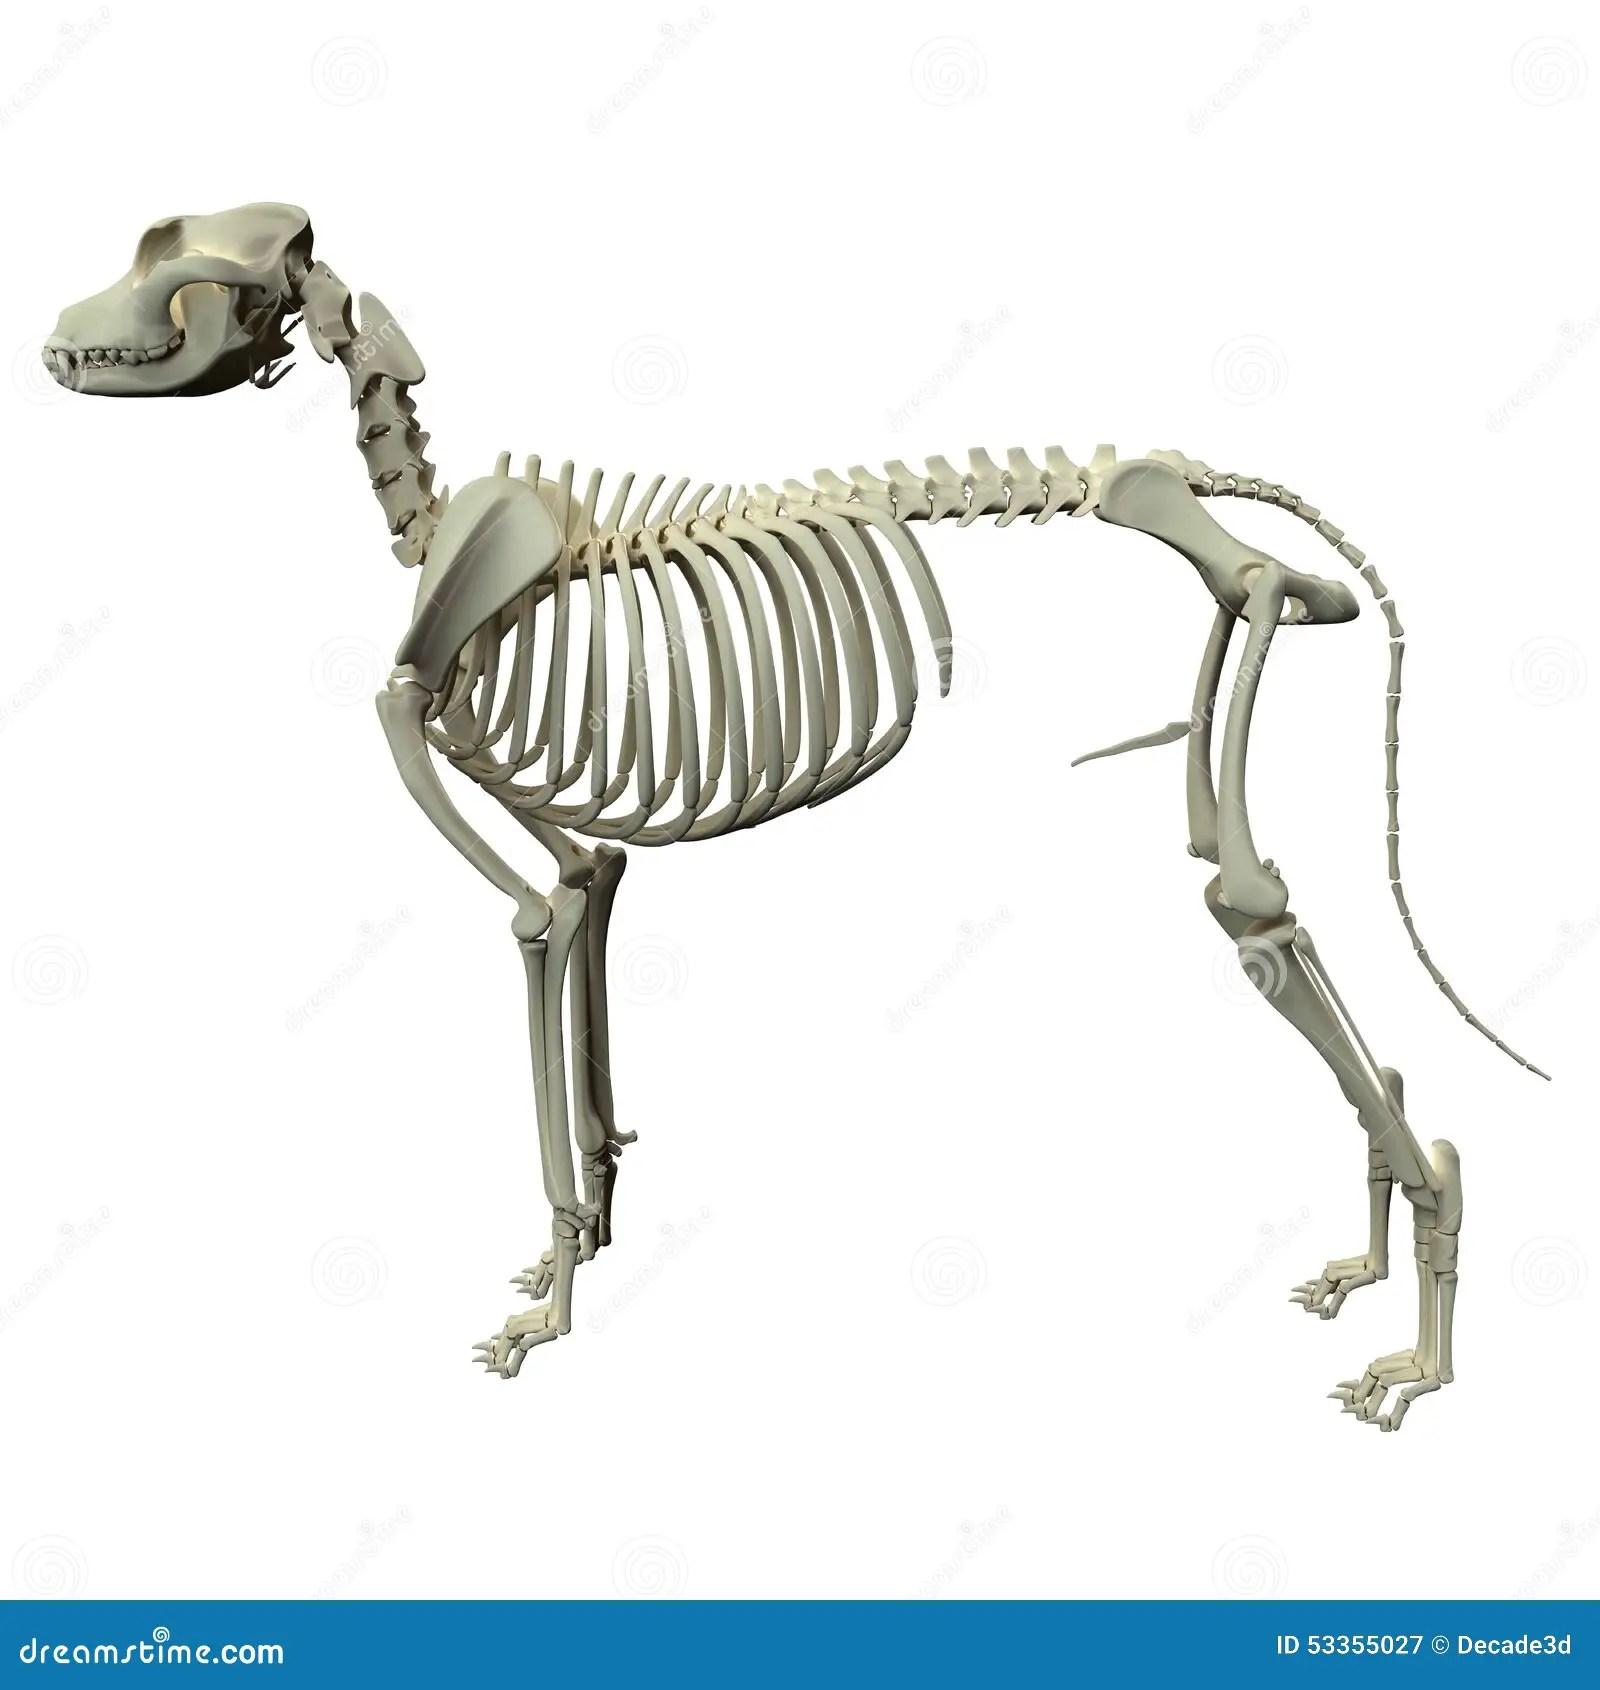 Spine Bones Diagrams Unlabeled